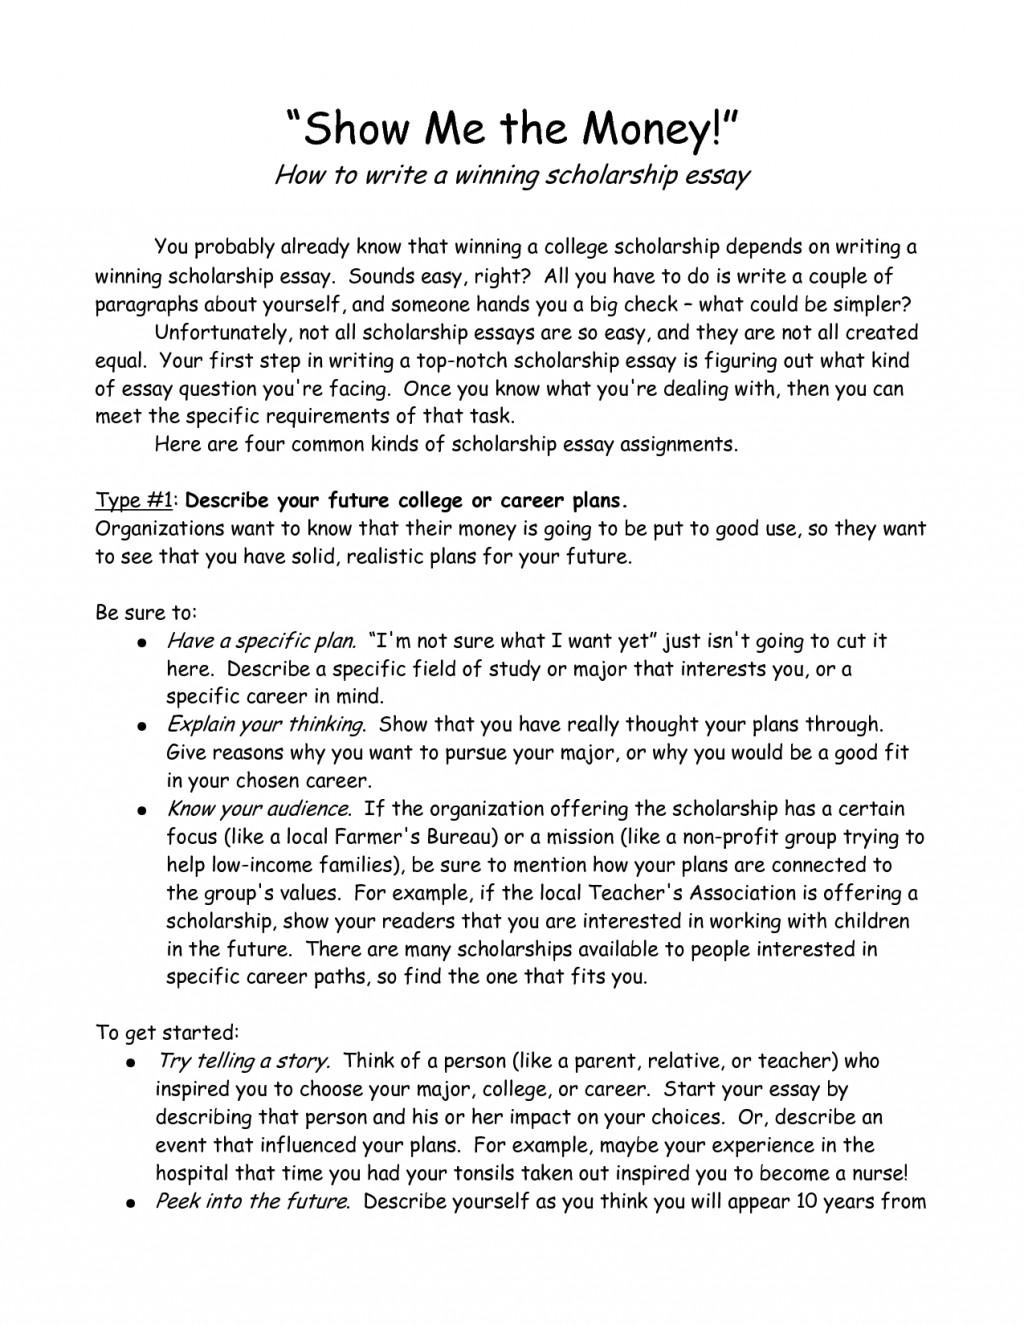 003 Scholarship Essay Tips Example Singular Rotc Psc Reddit Large